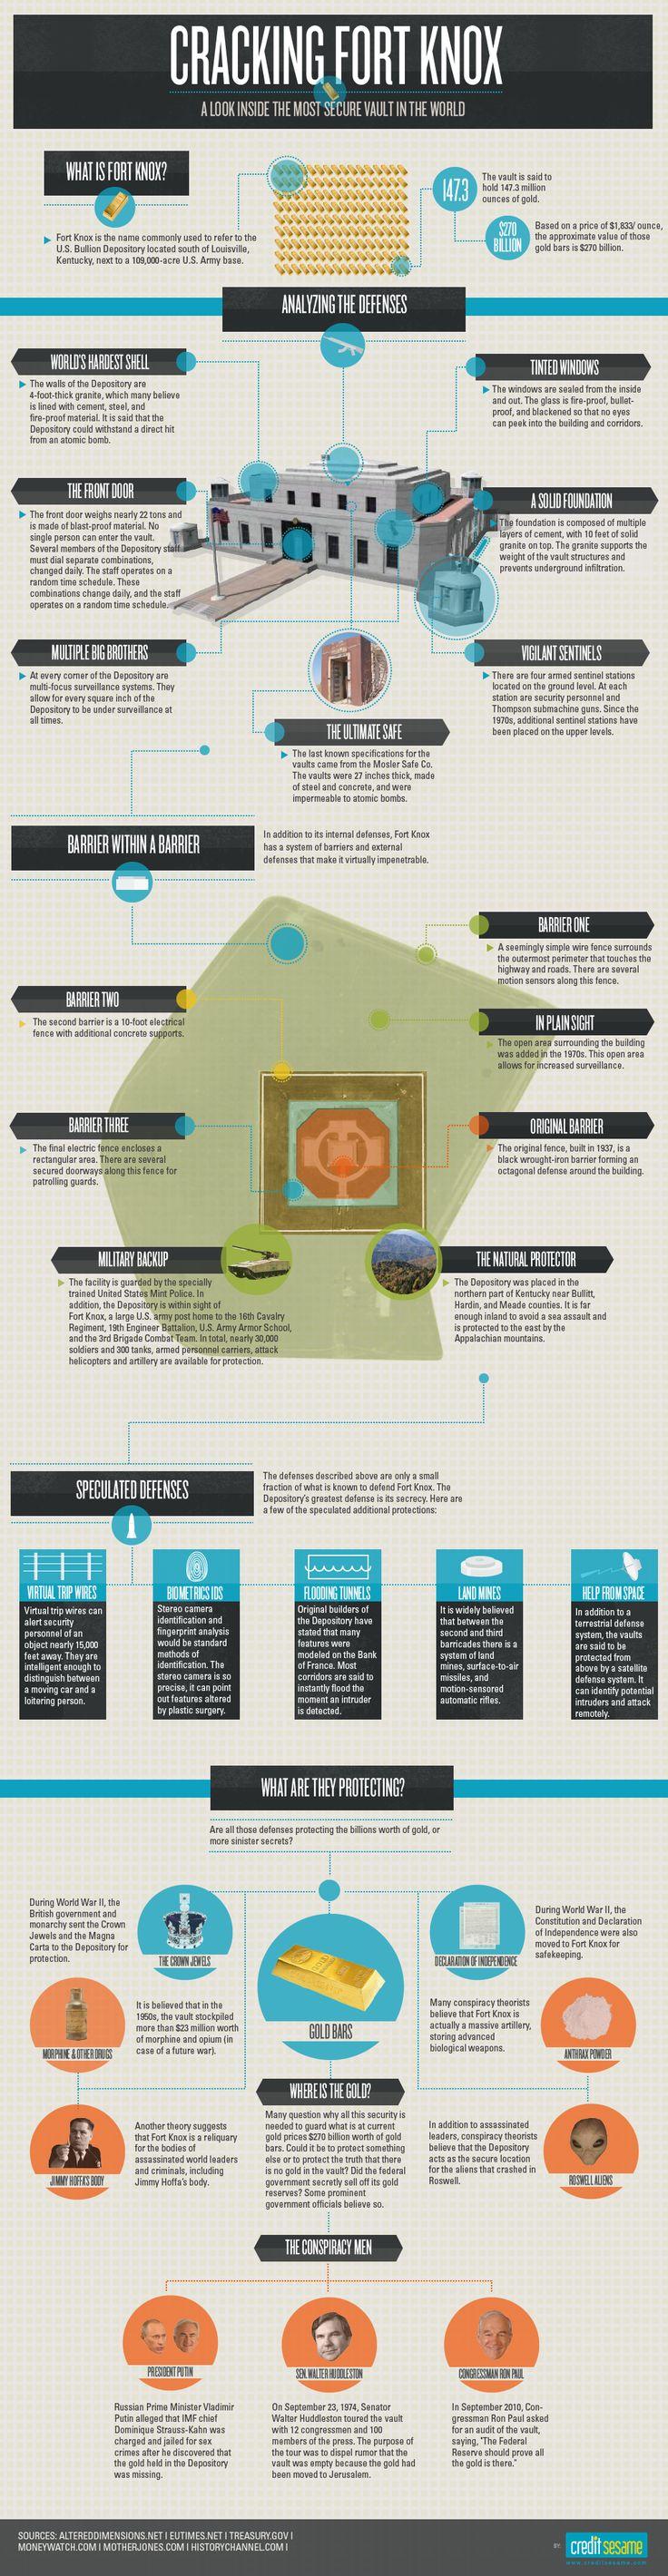 Best 25 Fort knox kentucky ideas – Knox Box 3b Wiring-diagram